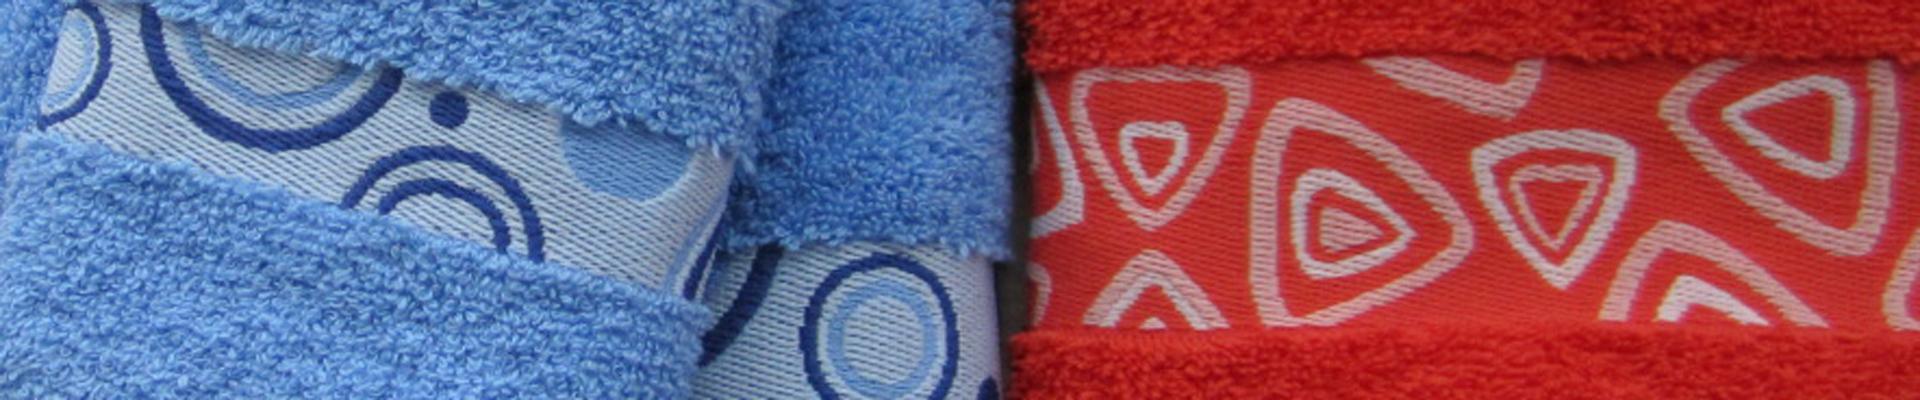 håndklæde-jacqurd-bort-uniquemade